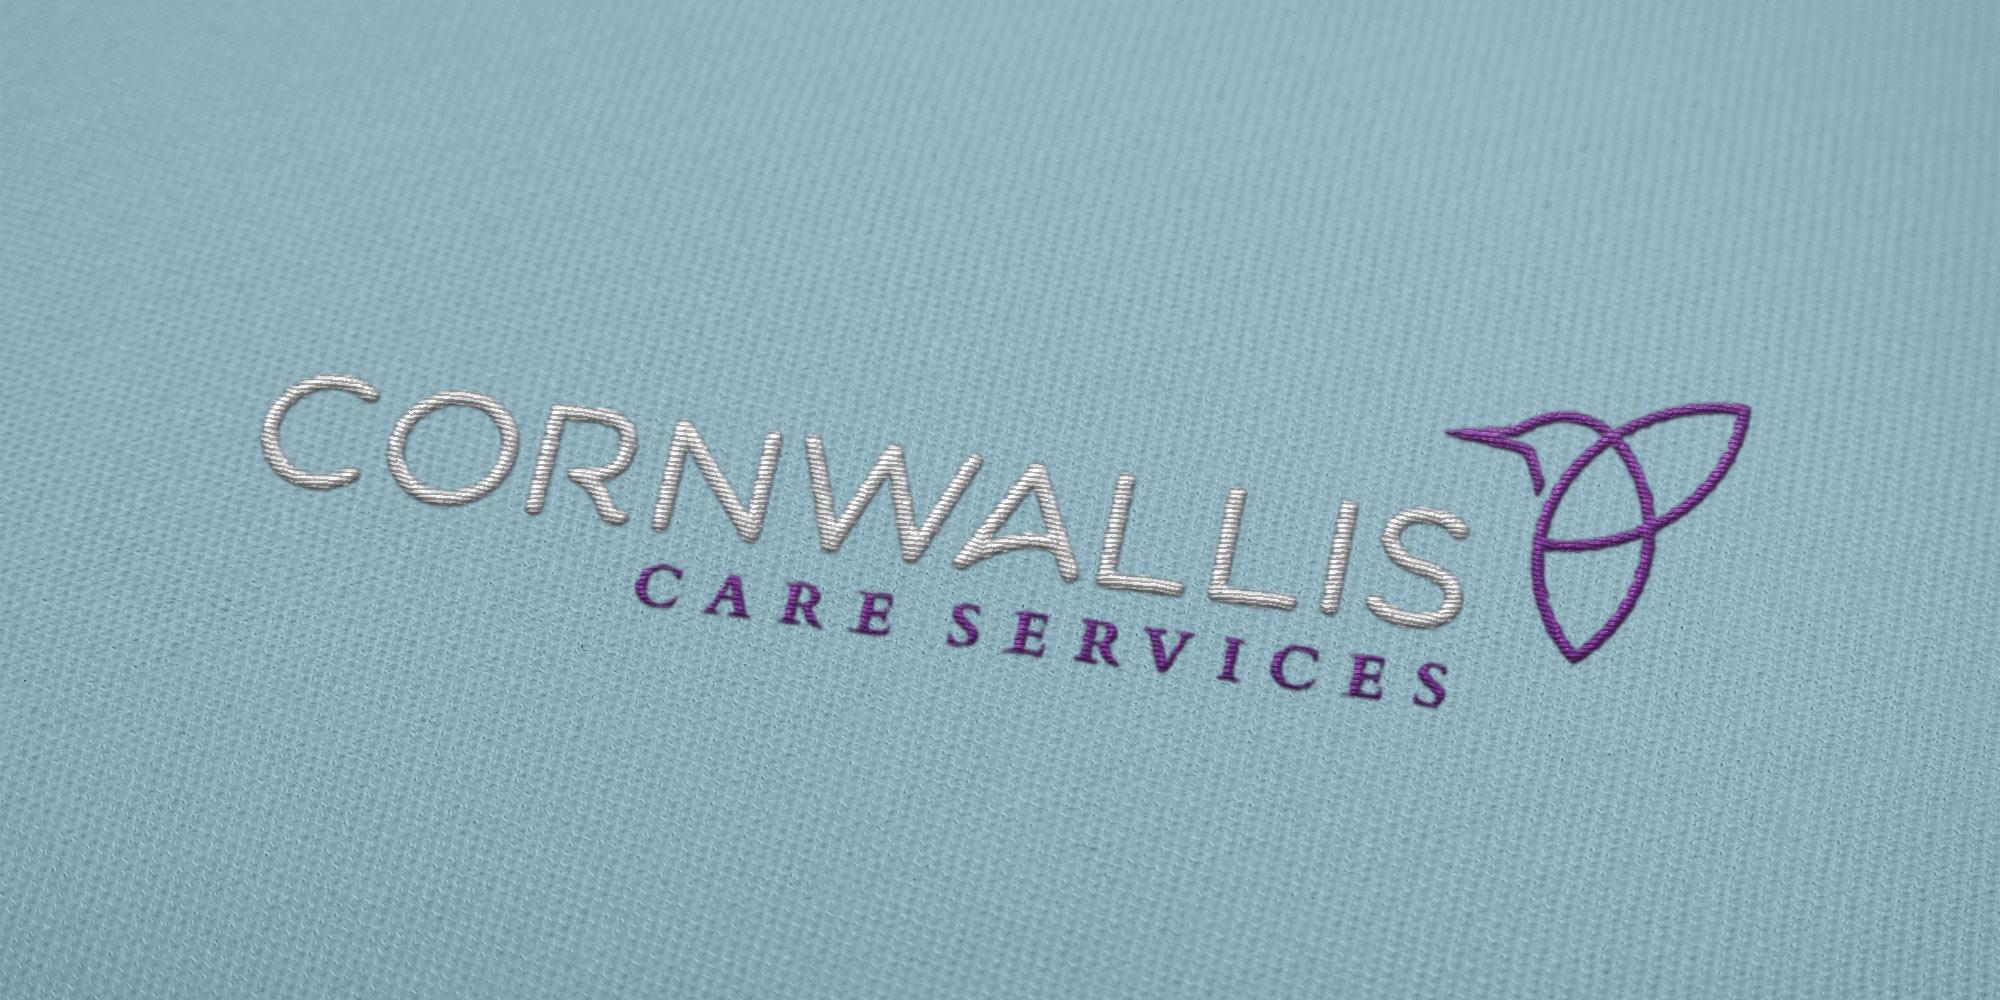 Cornwallis Care Logo Design on Uniform